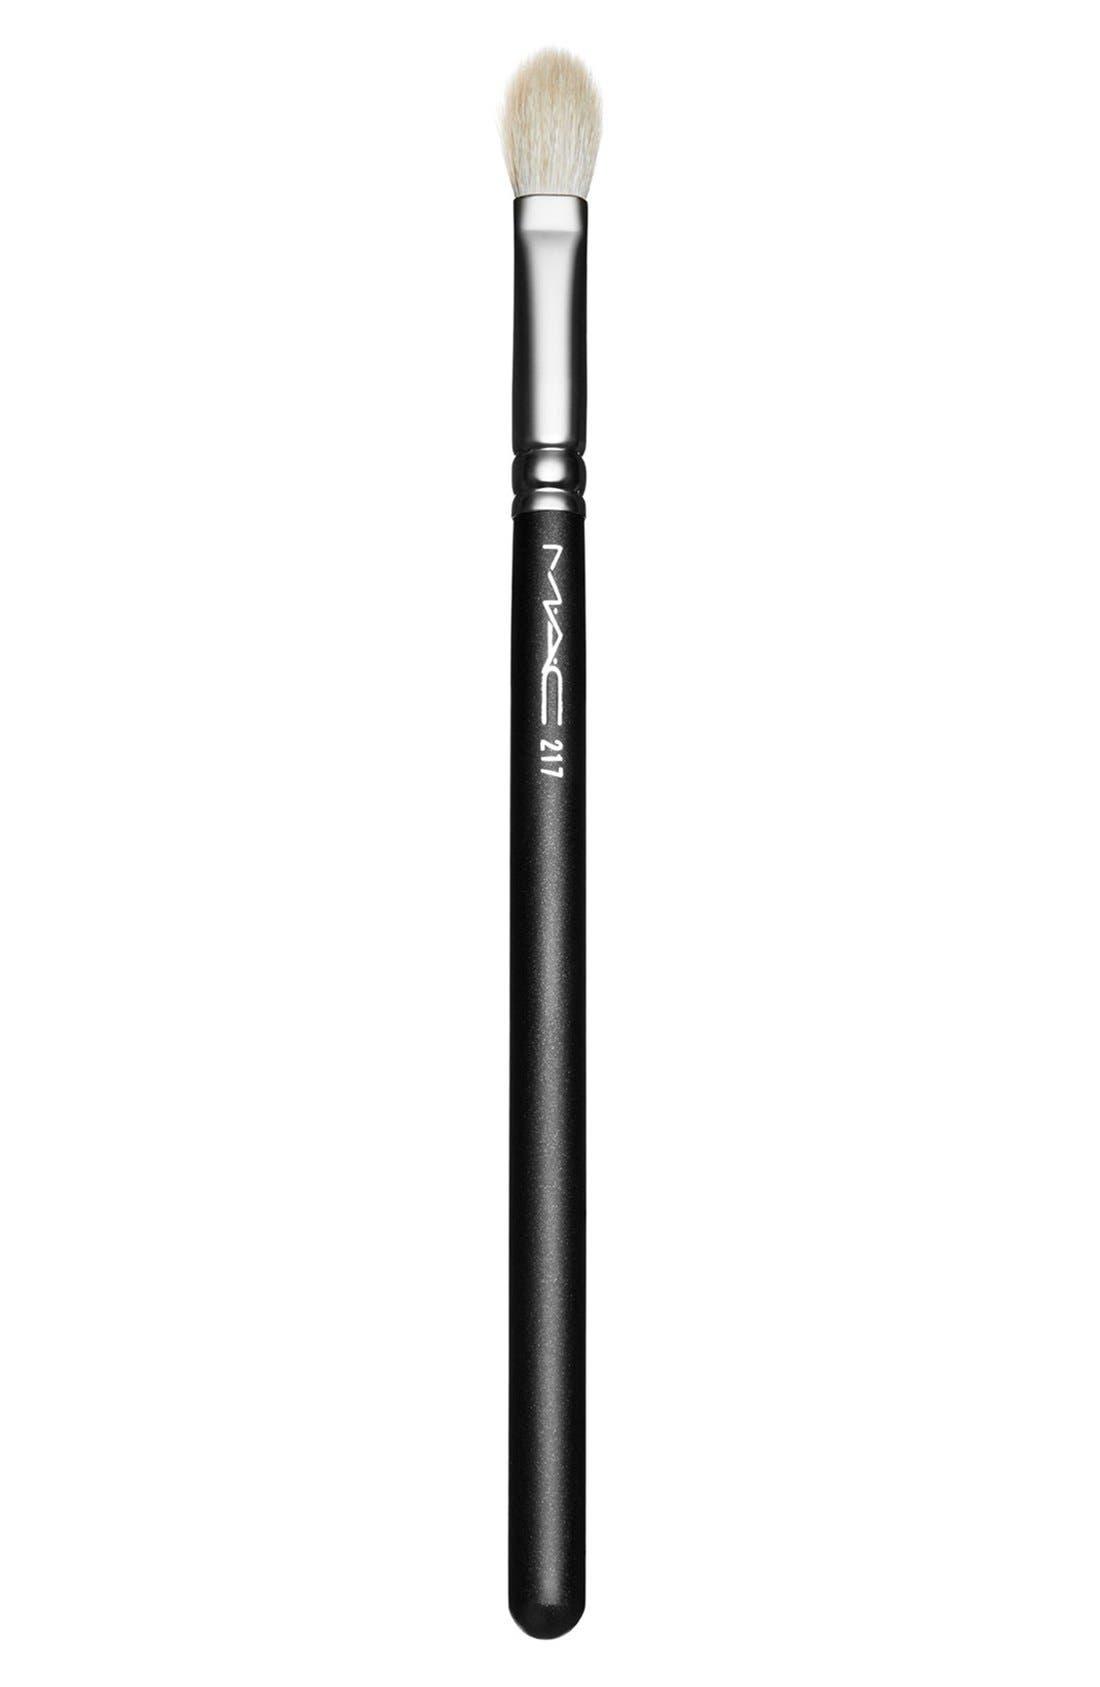 MAC 217 Blending Brush,                             Main thumbnail 1, color,                             000